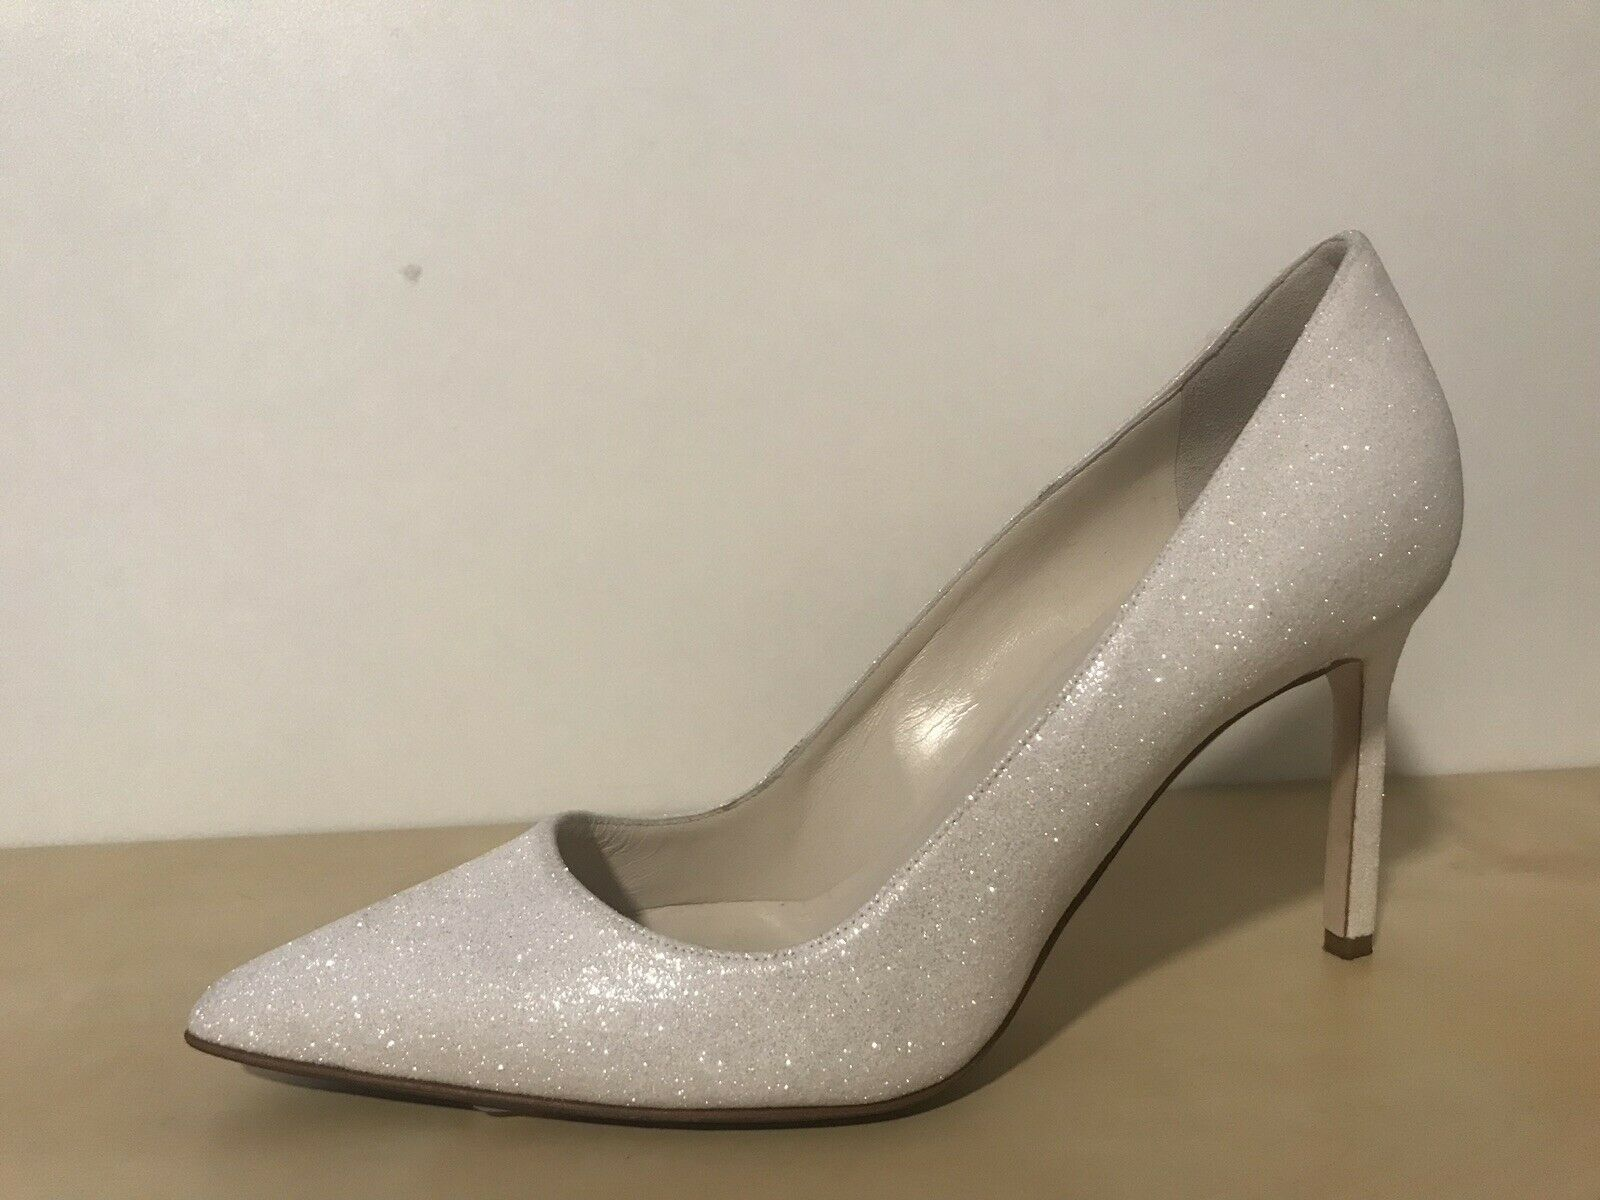 695 Manolo Blahnik BB 90 White Glitter Pointed Toe Pump Shoes 38 Eur 75 US